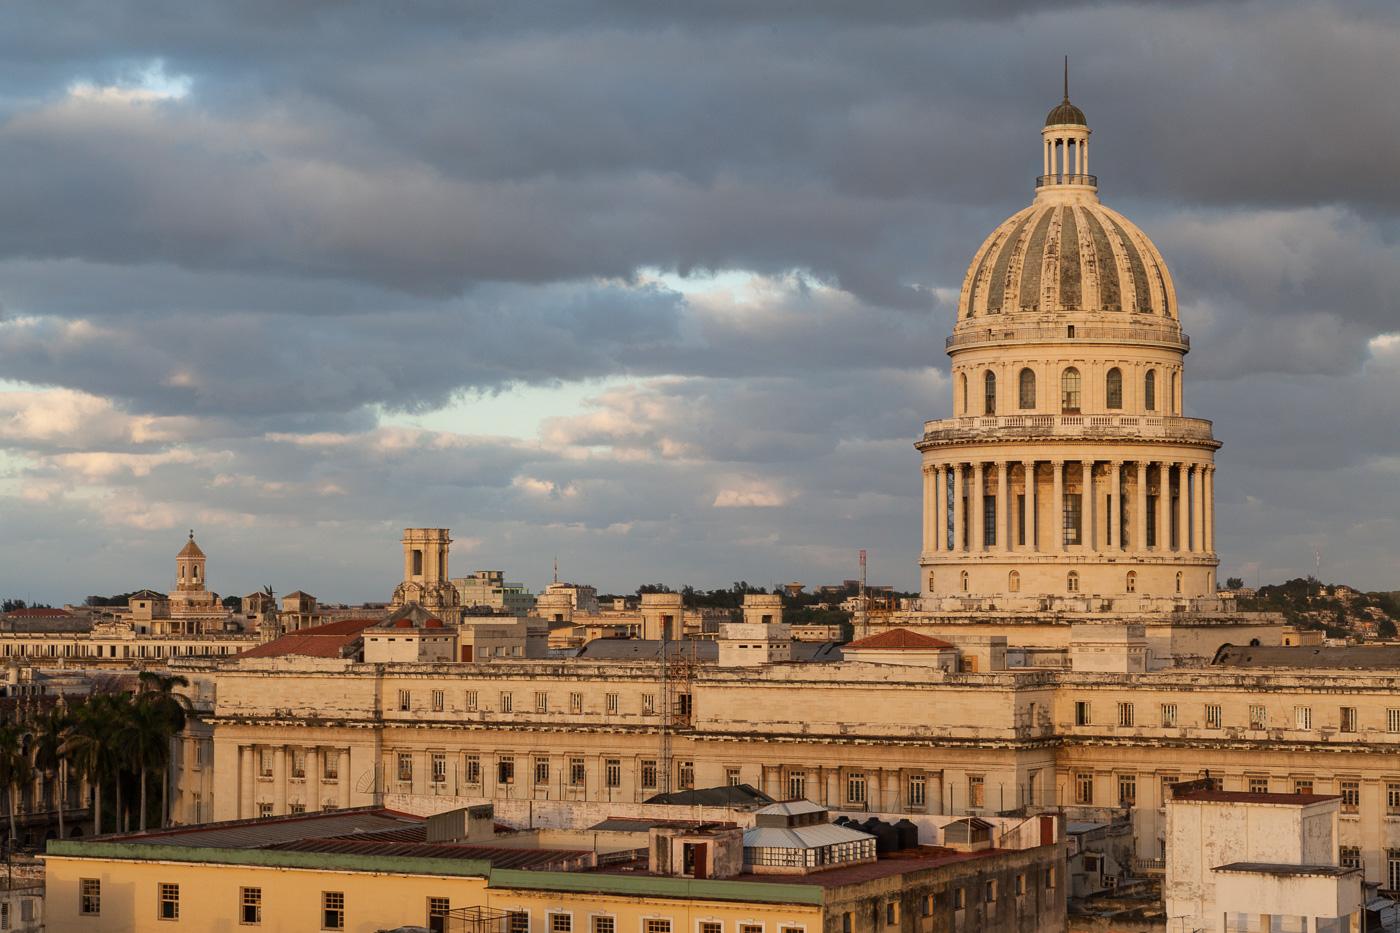 National Capitol Building at Dusk